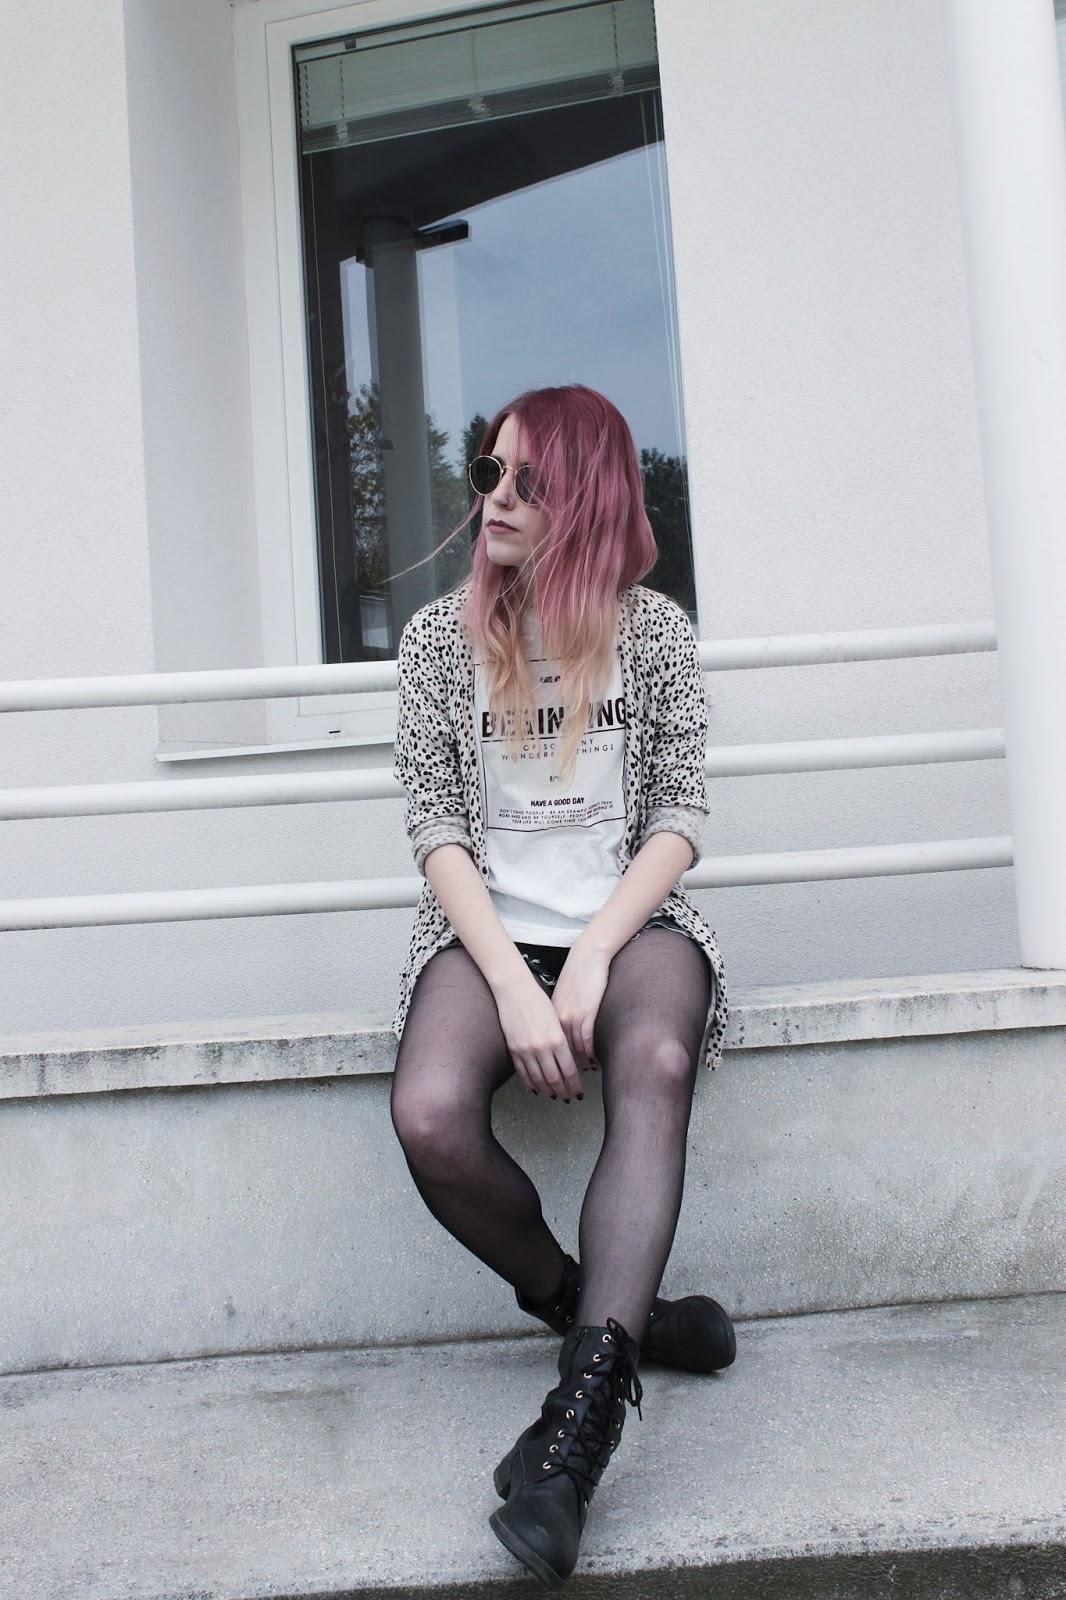 Street style legwear looks boreale-blogmode.blogspot.co.uk